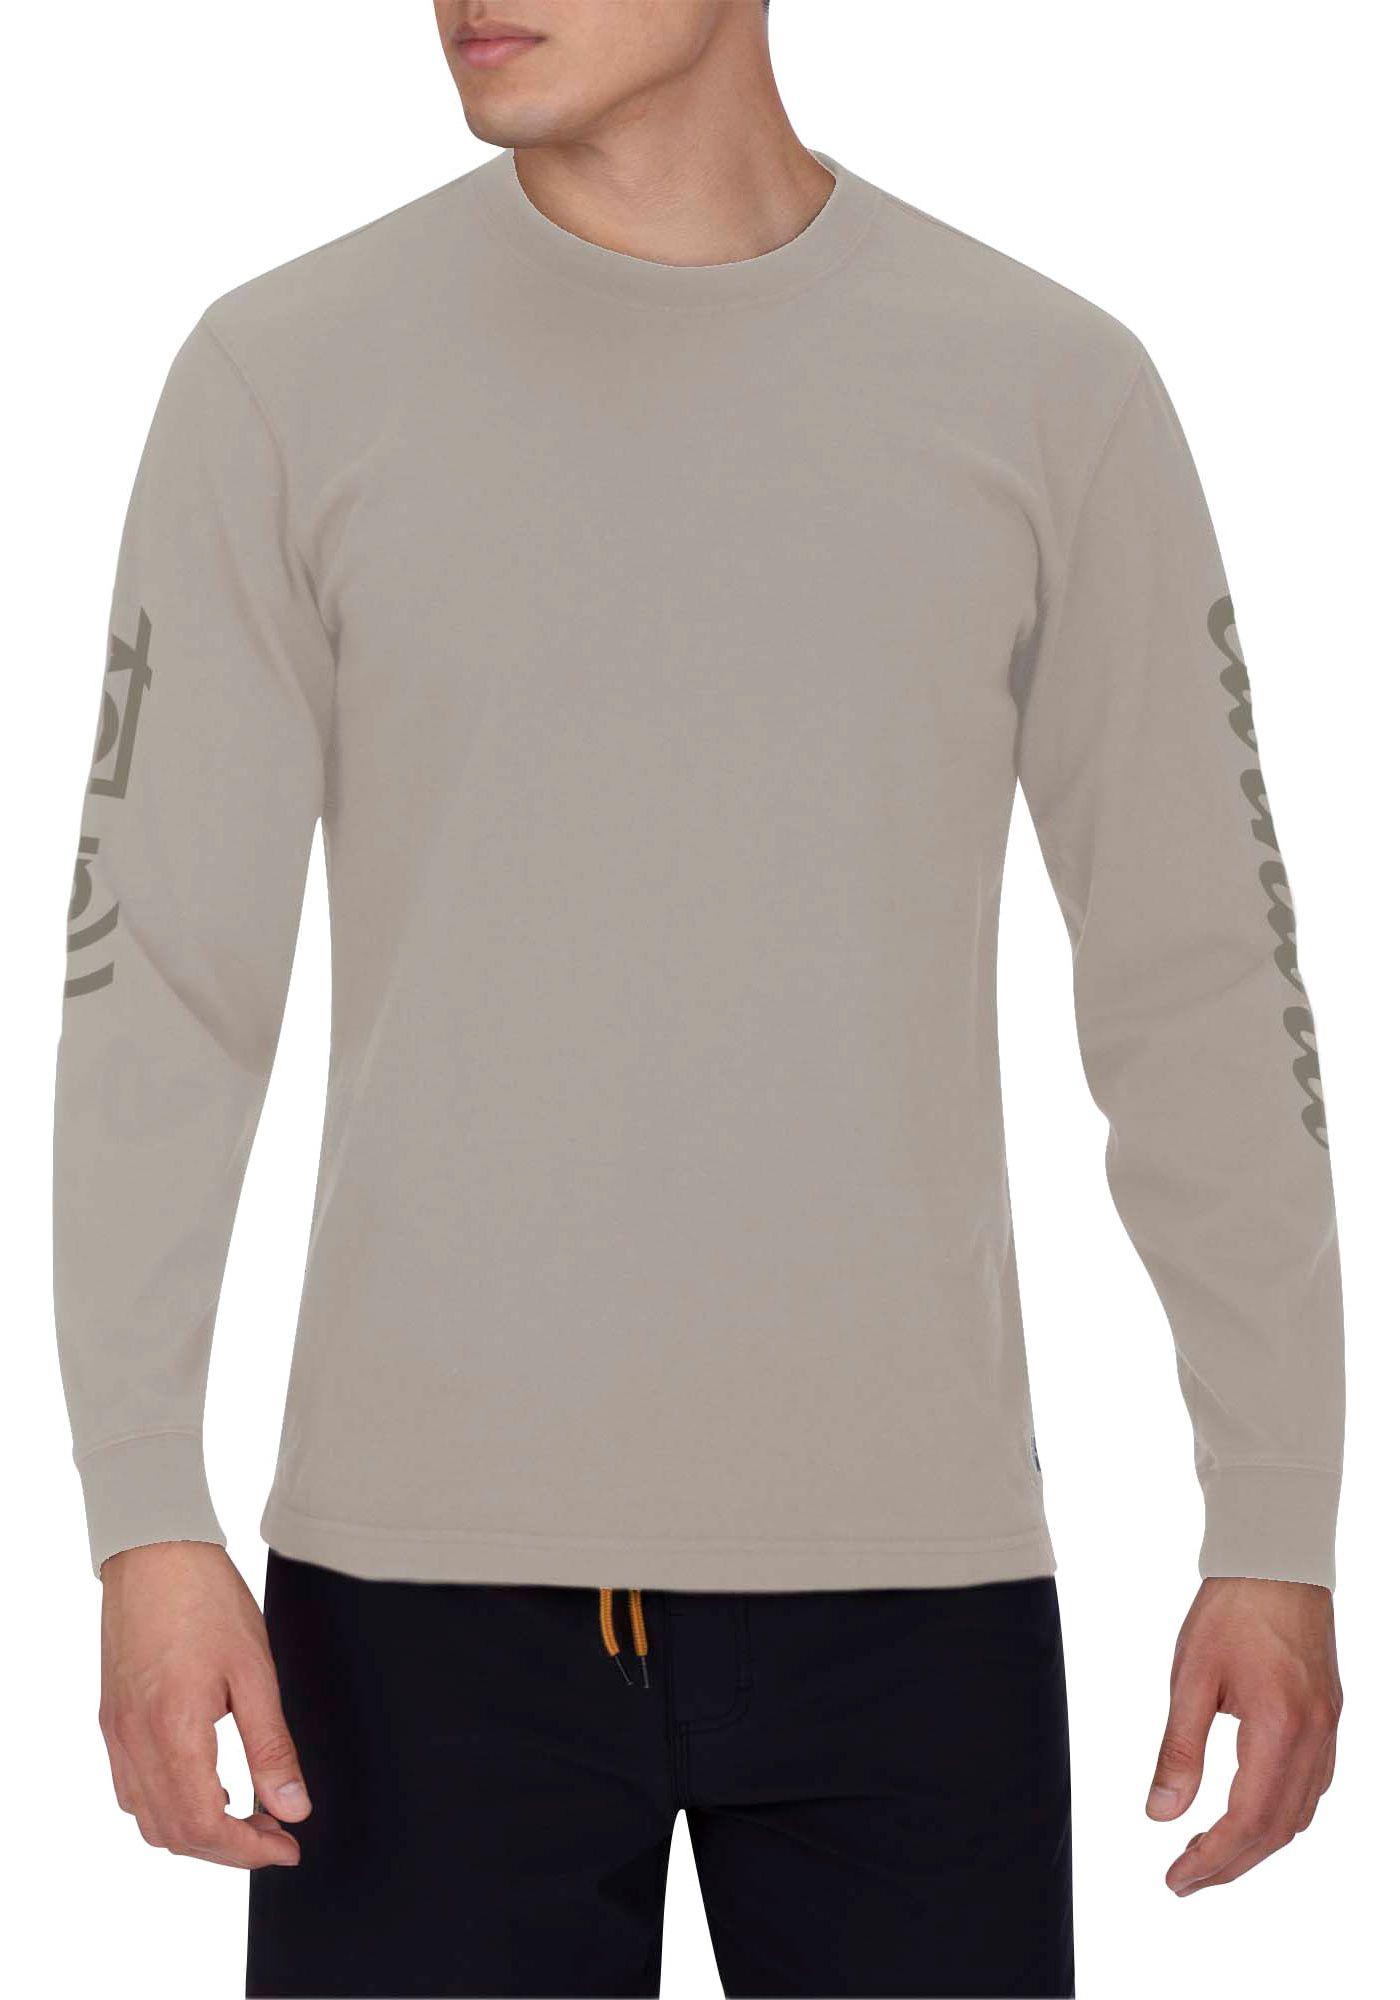 Hurley Men's Carhartt BFY Long Sleeve Shirt